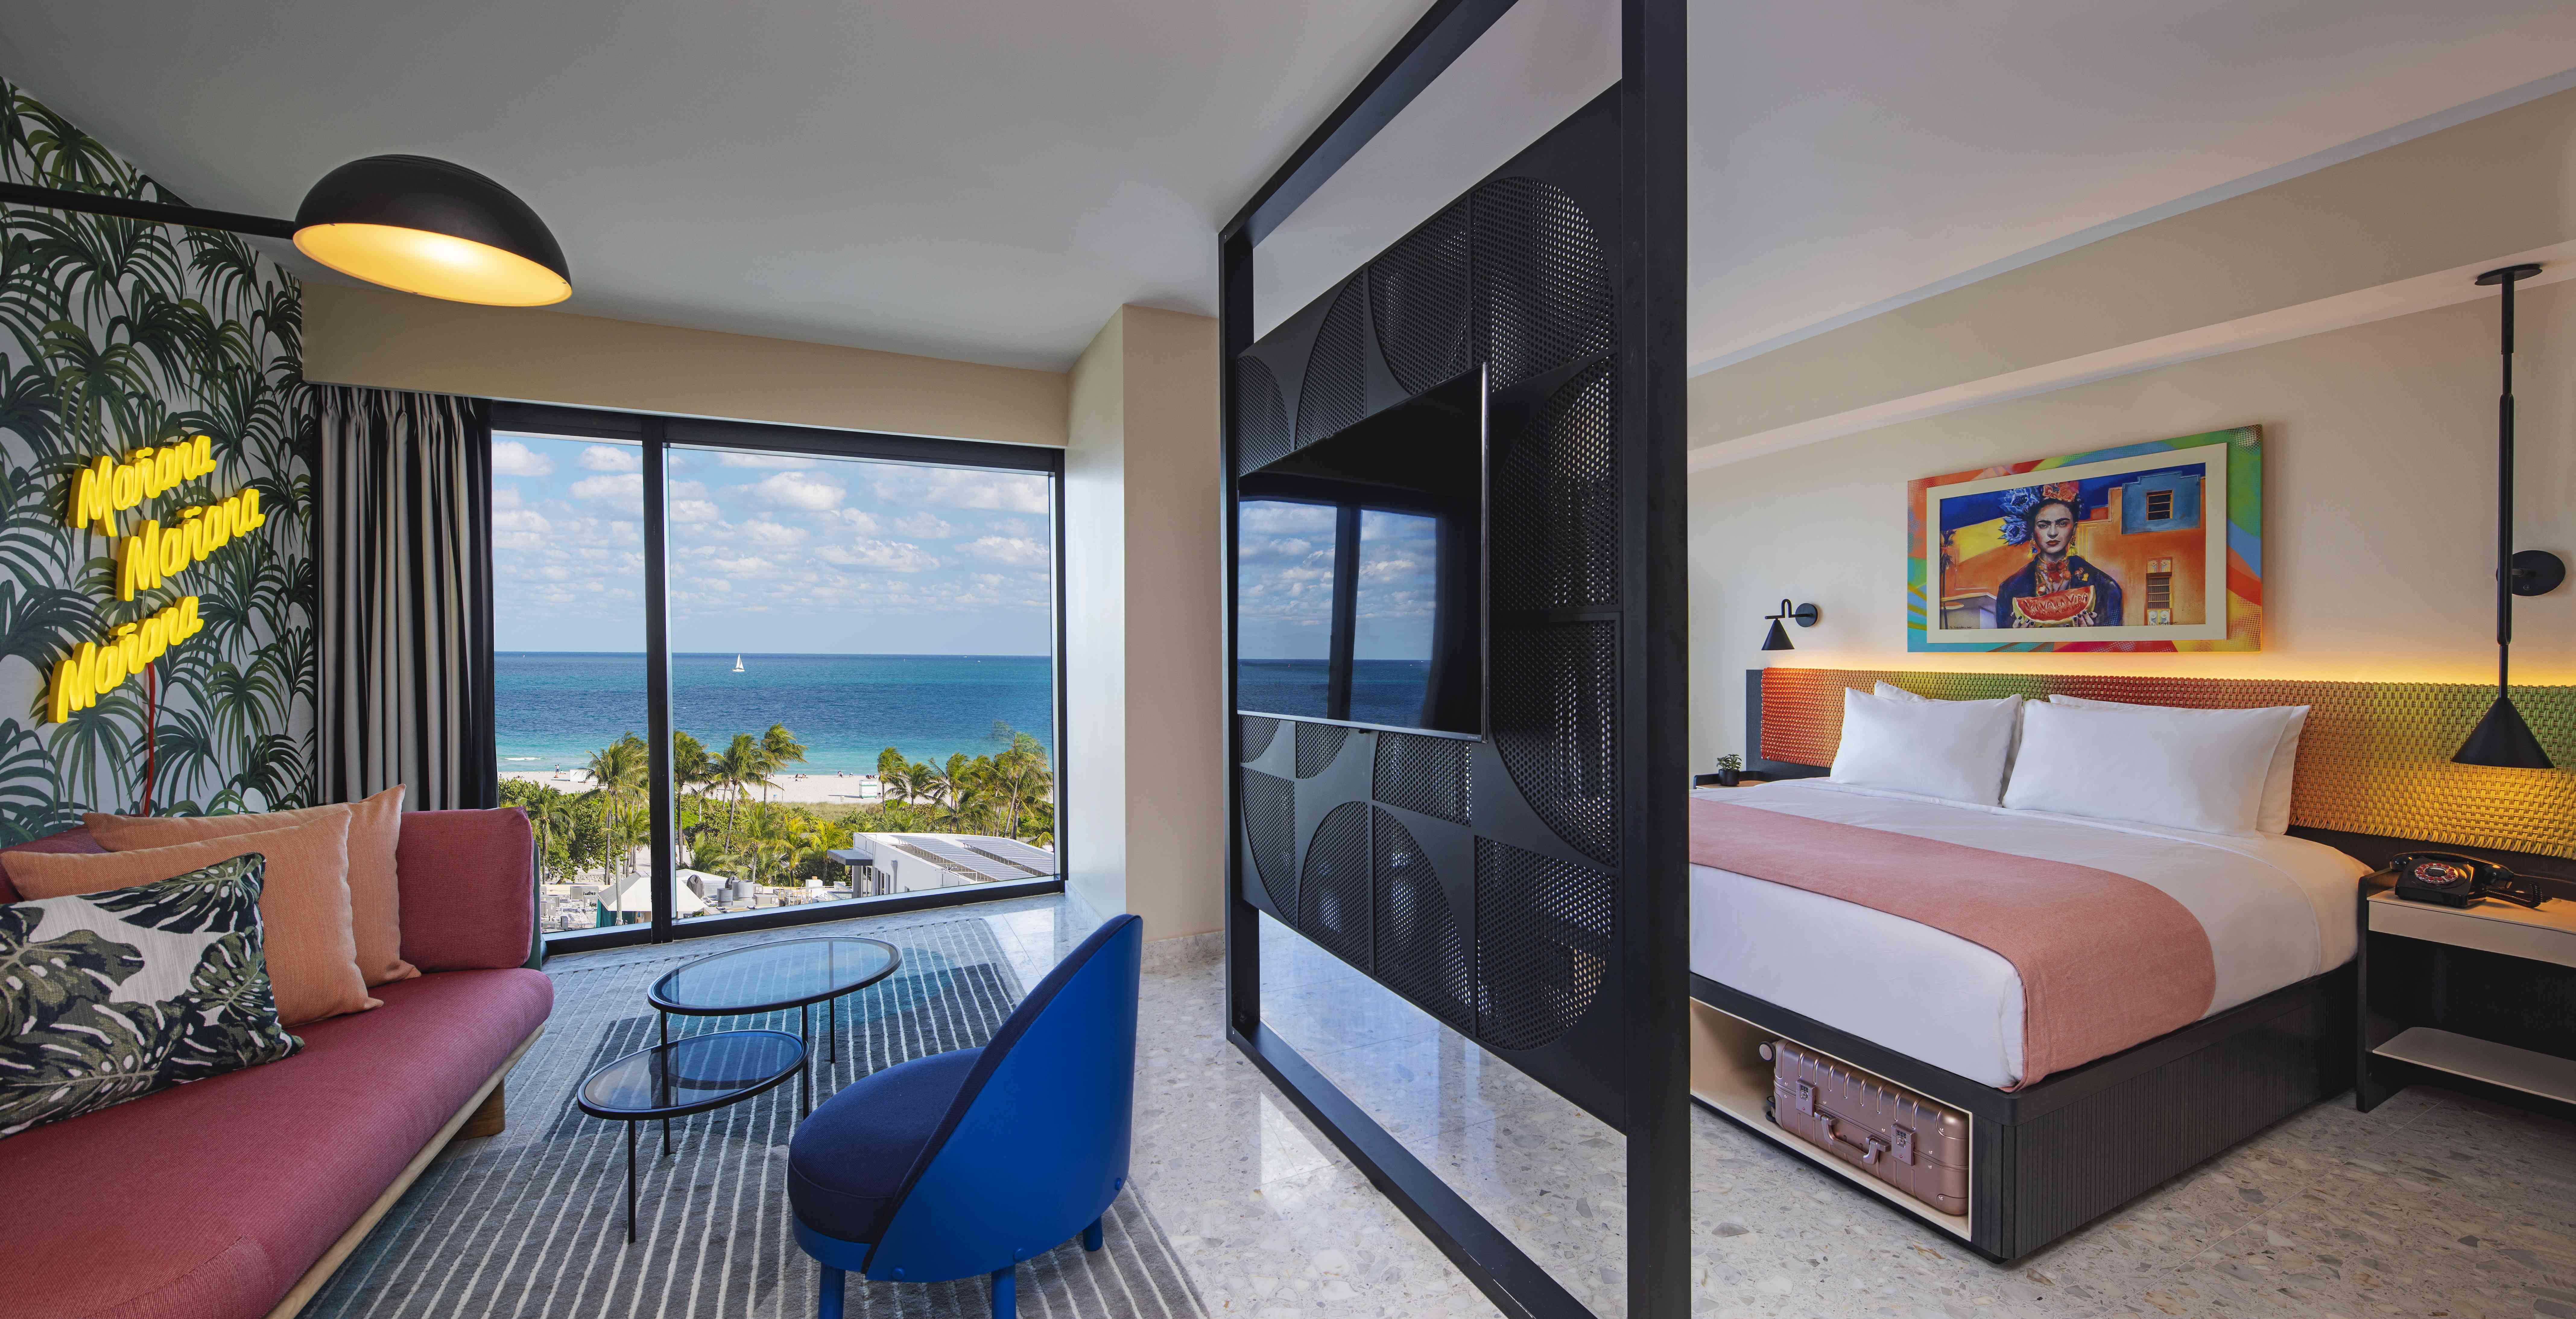 Moxy South Beach room